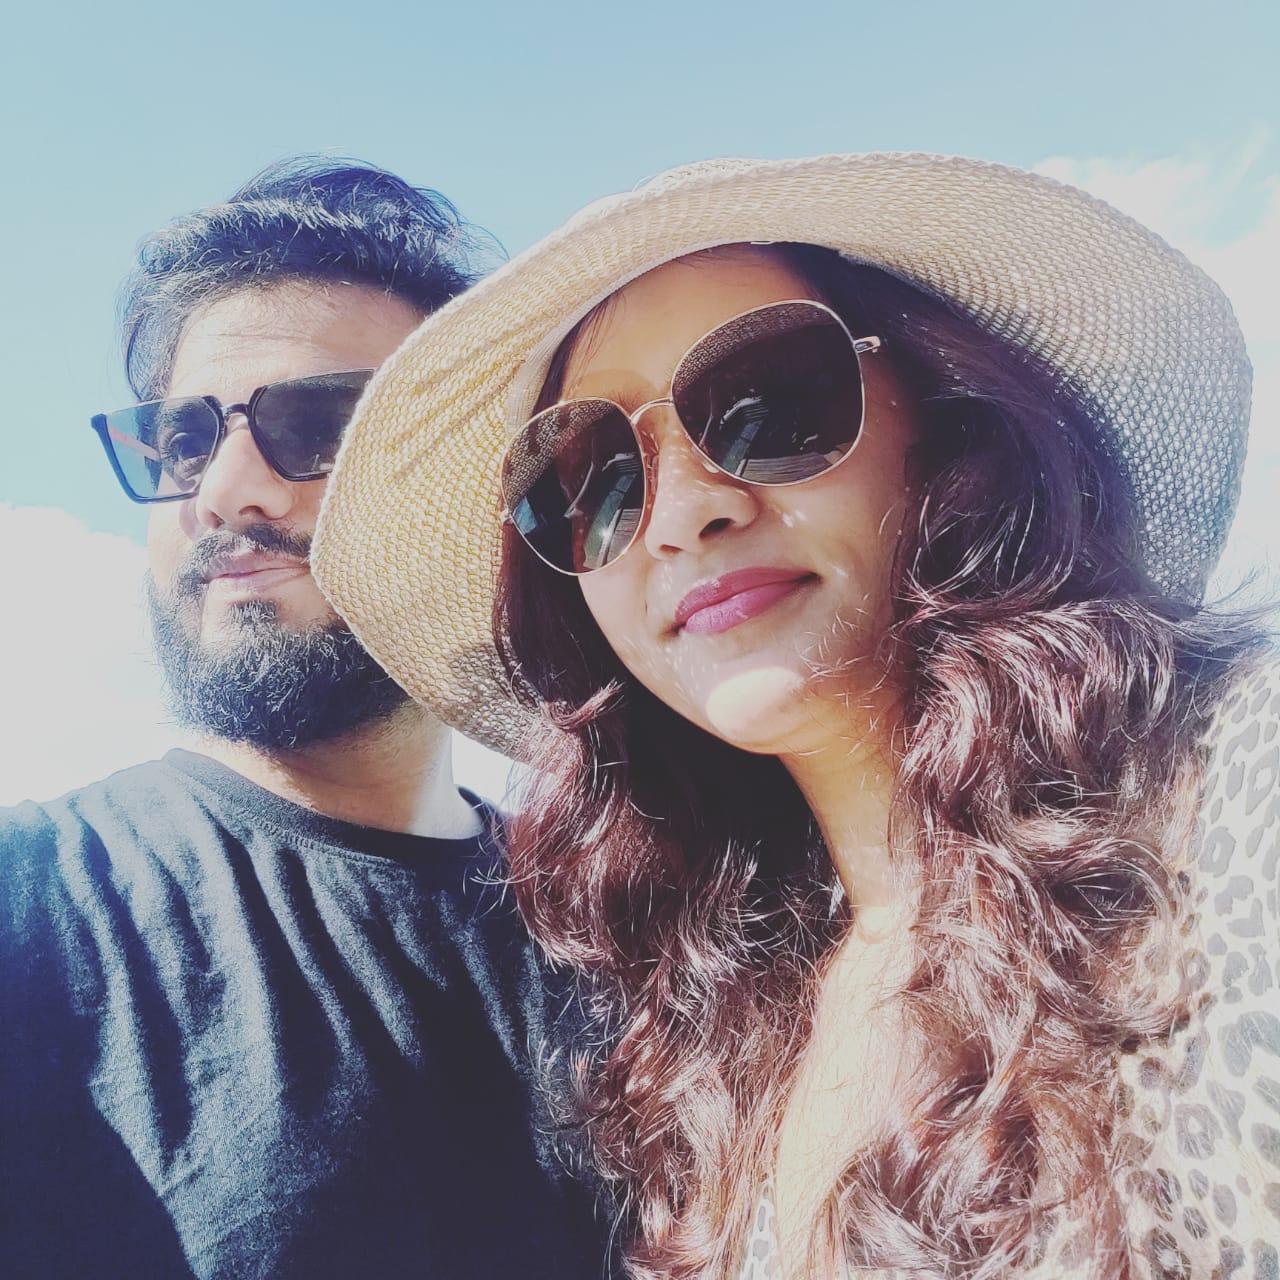 travelling diva, diva , travel, travelling couples, ghumakkad chatore, ghumakad chatore, ghumakkad